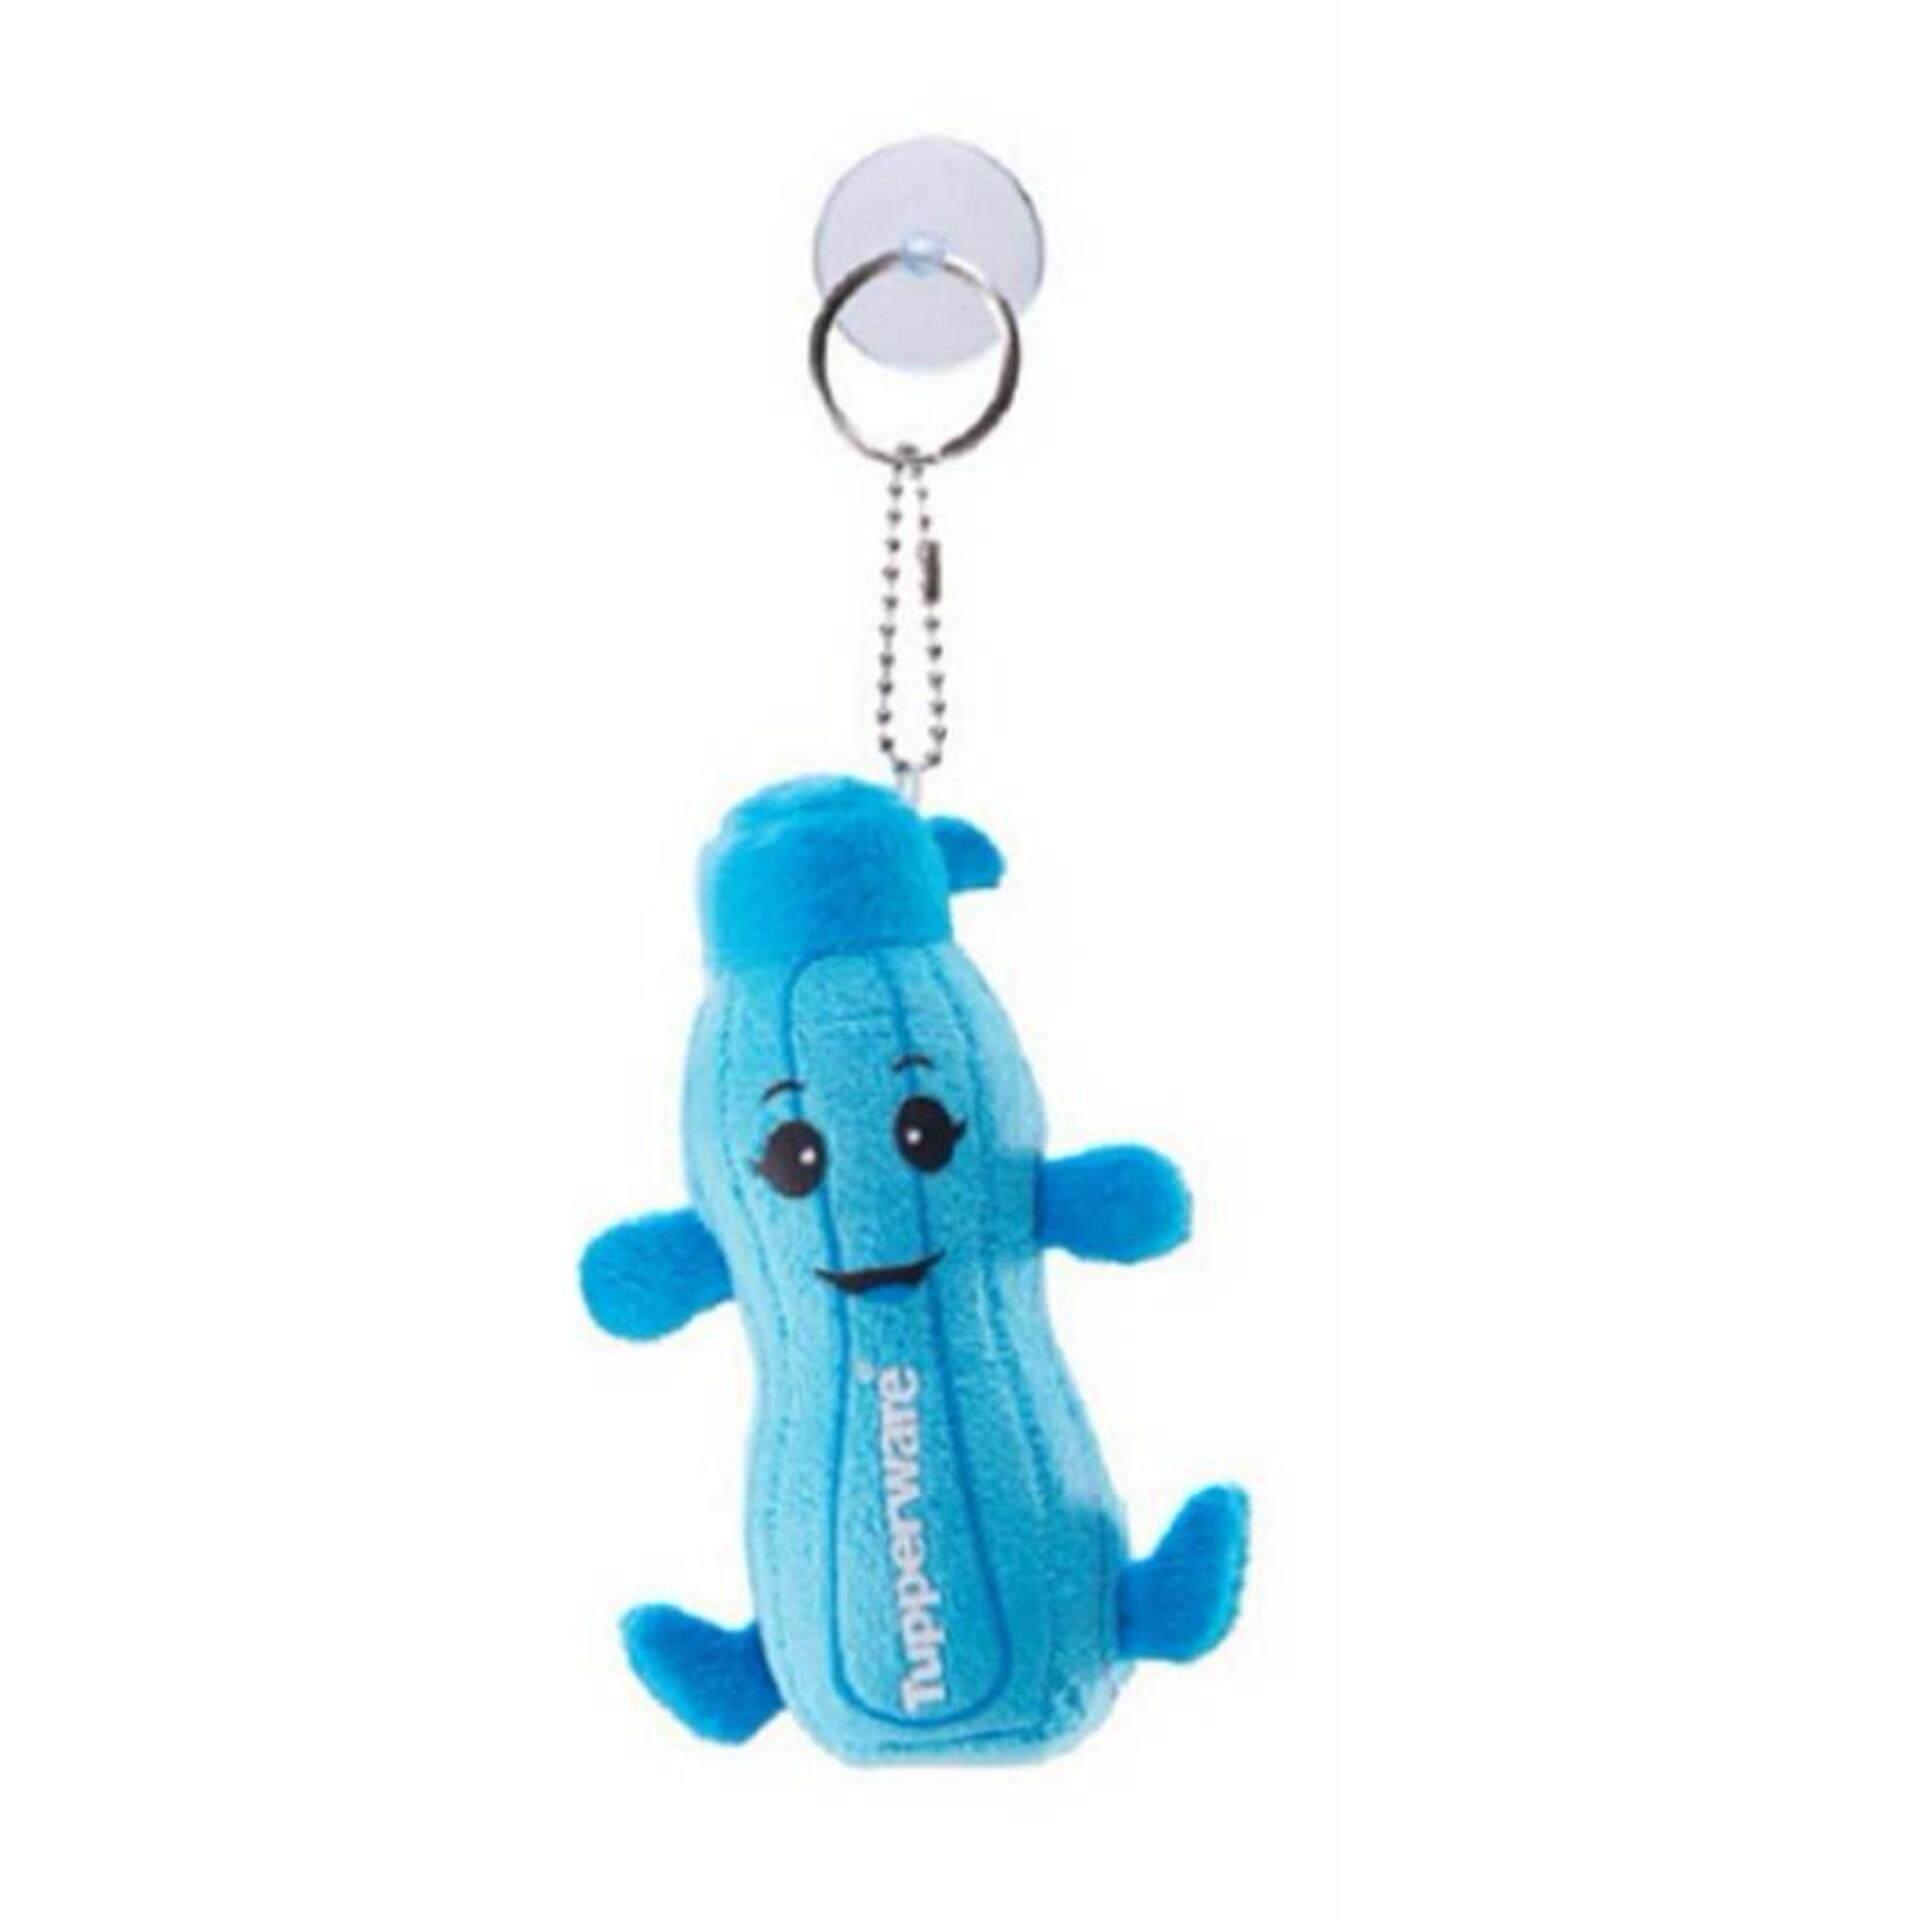 Tupperware Eco Bottle Soft Toys (1) - Blue